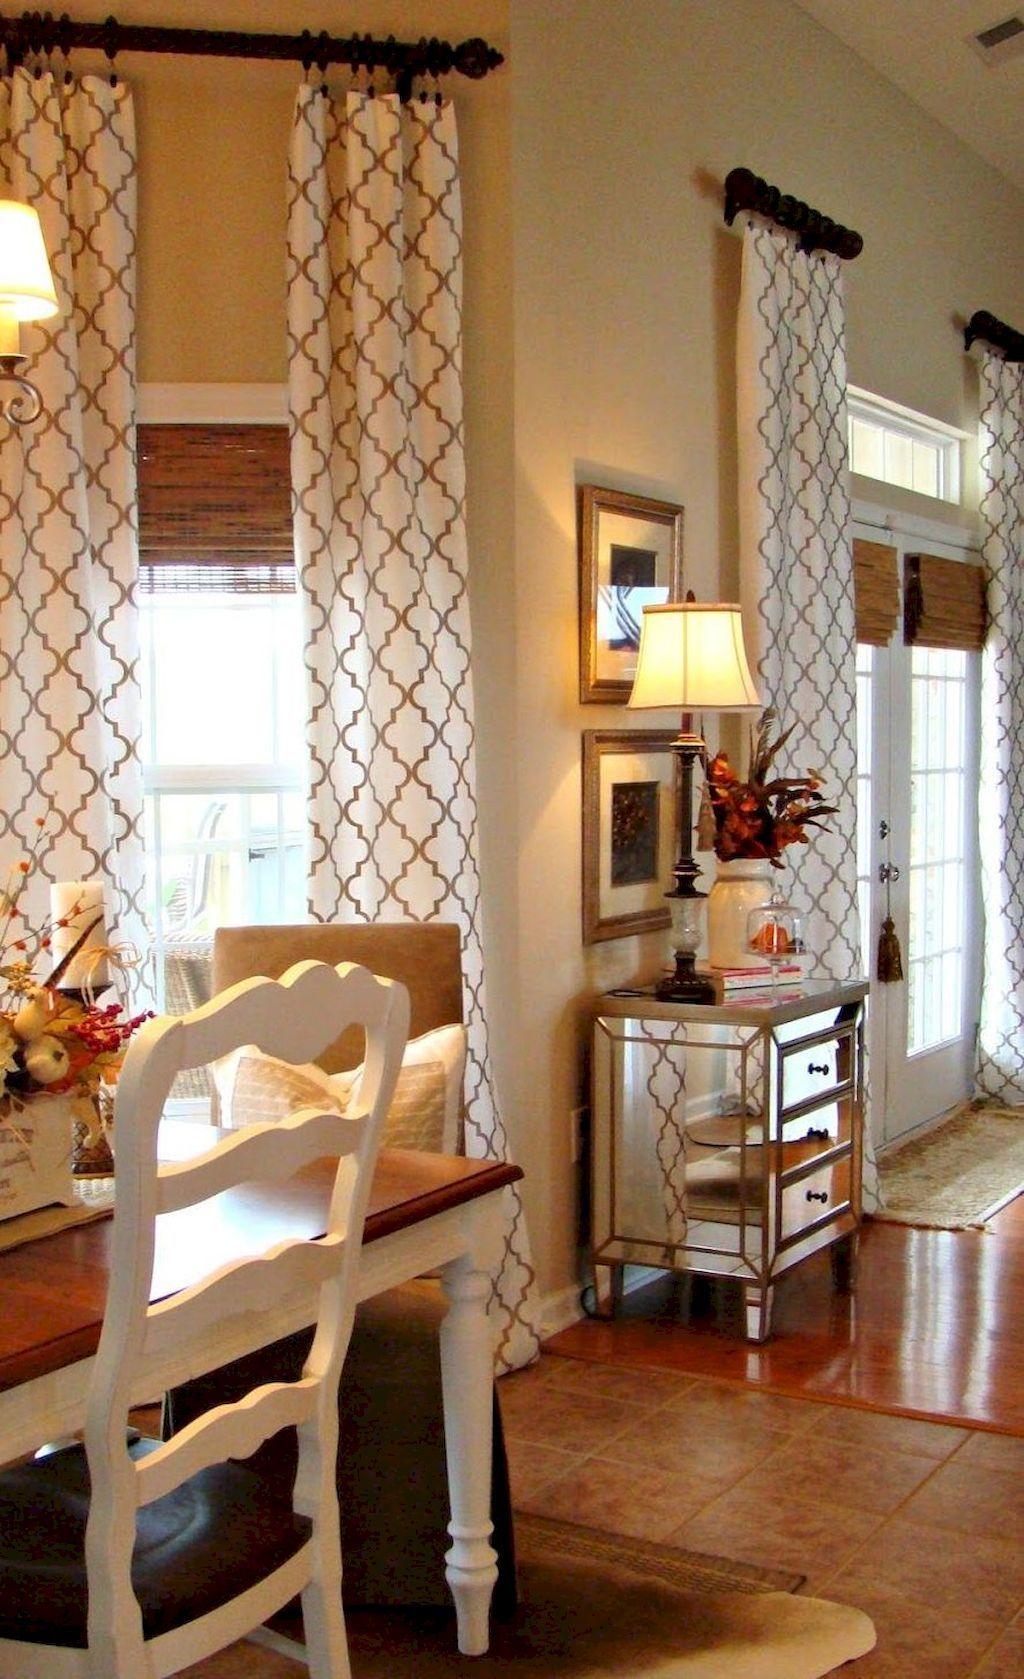 95 Modern Farmhouse Curtains for Living Room Decorating ... on Farmhouse Curtain Ideas For Living Room  id=50623